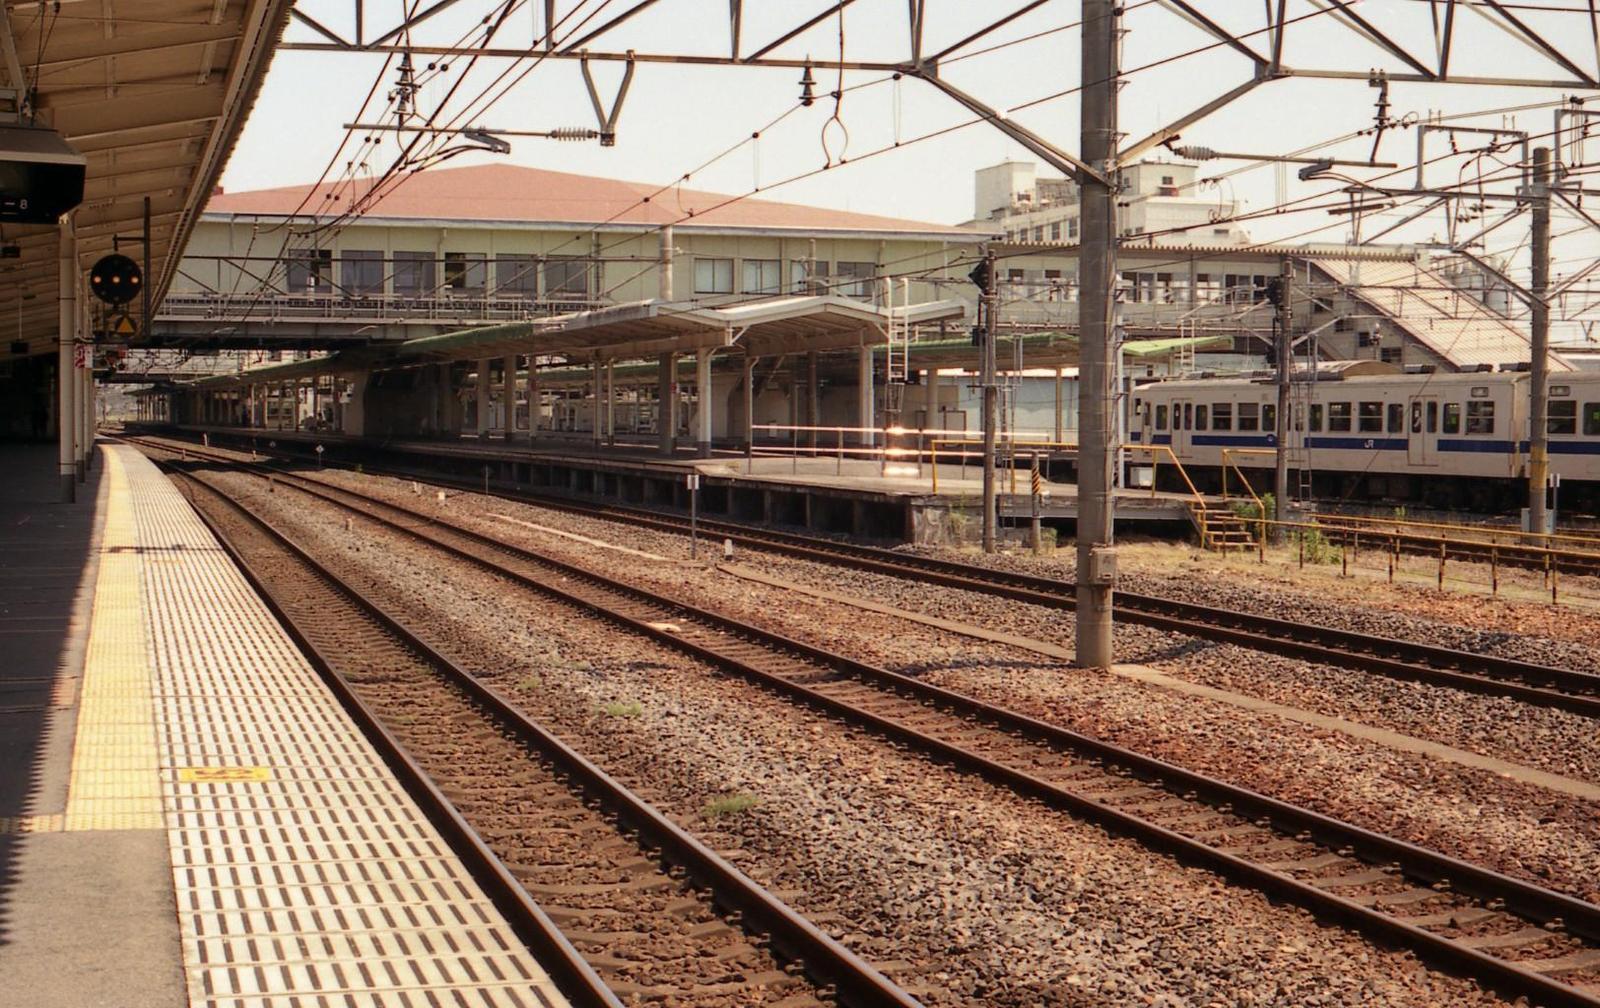 20020526a55